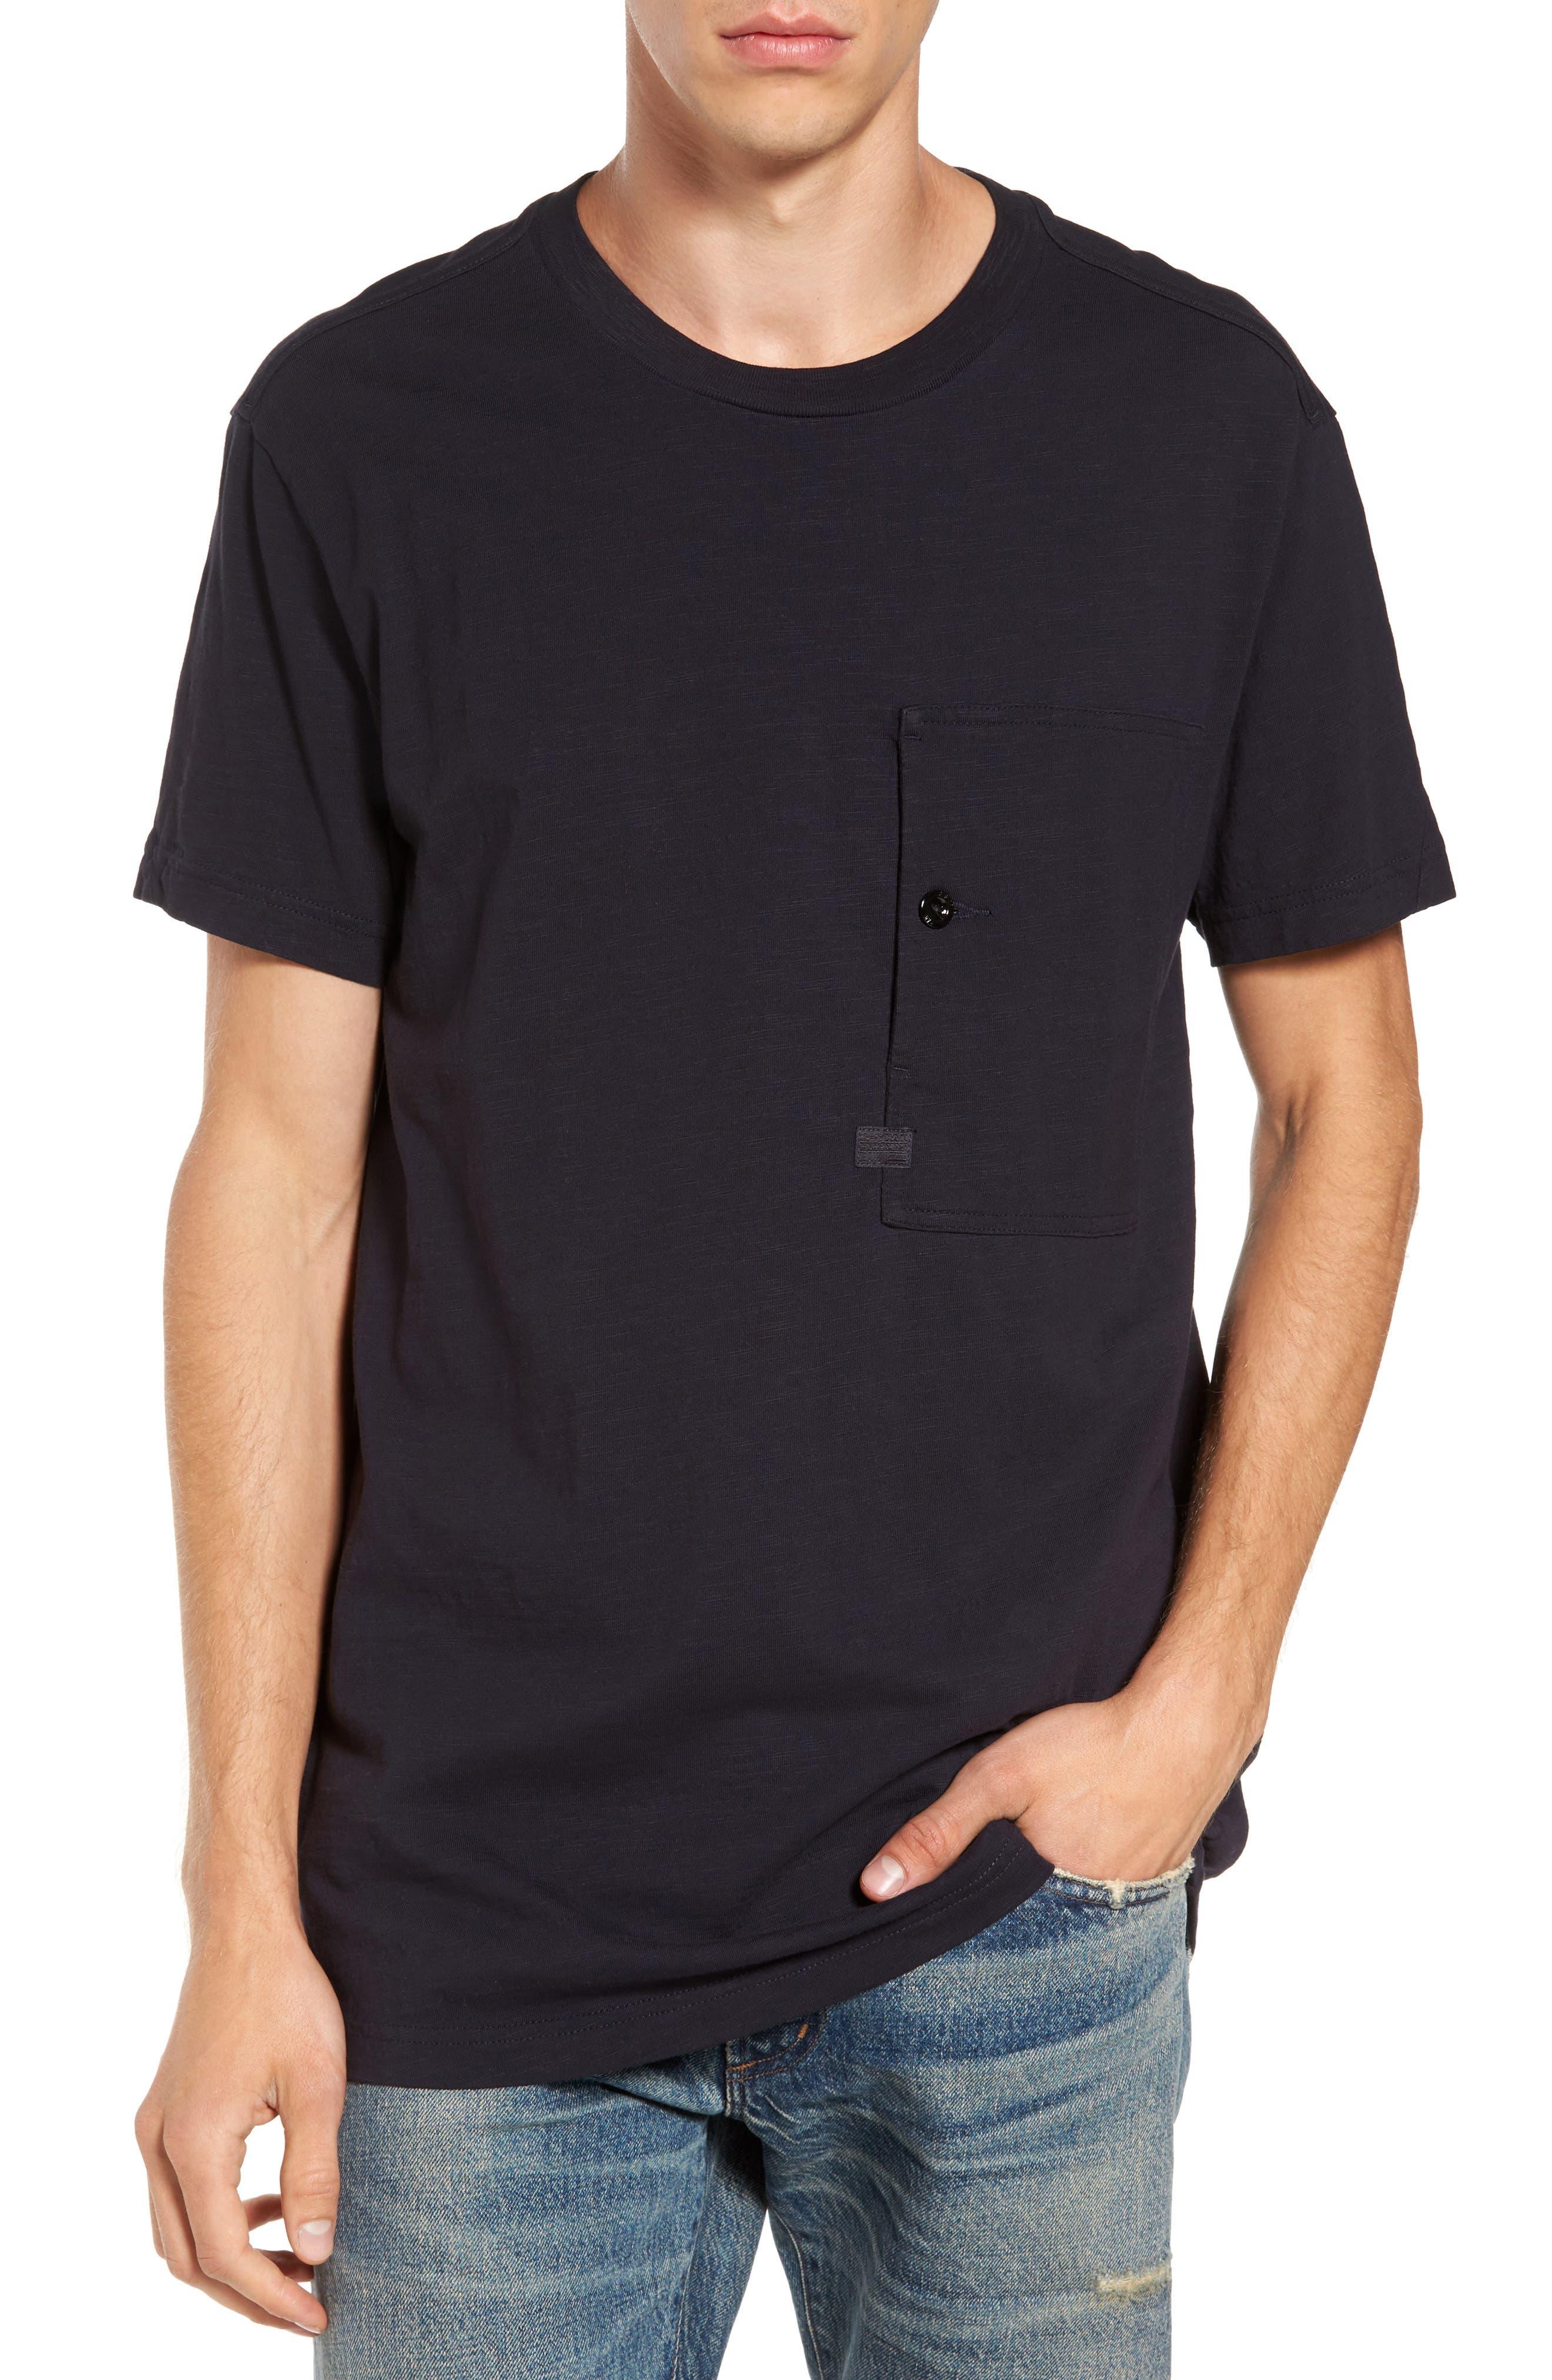 G-Star Raw Stalt Pocket T-Shirt